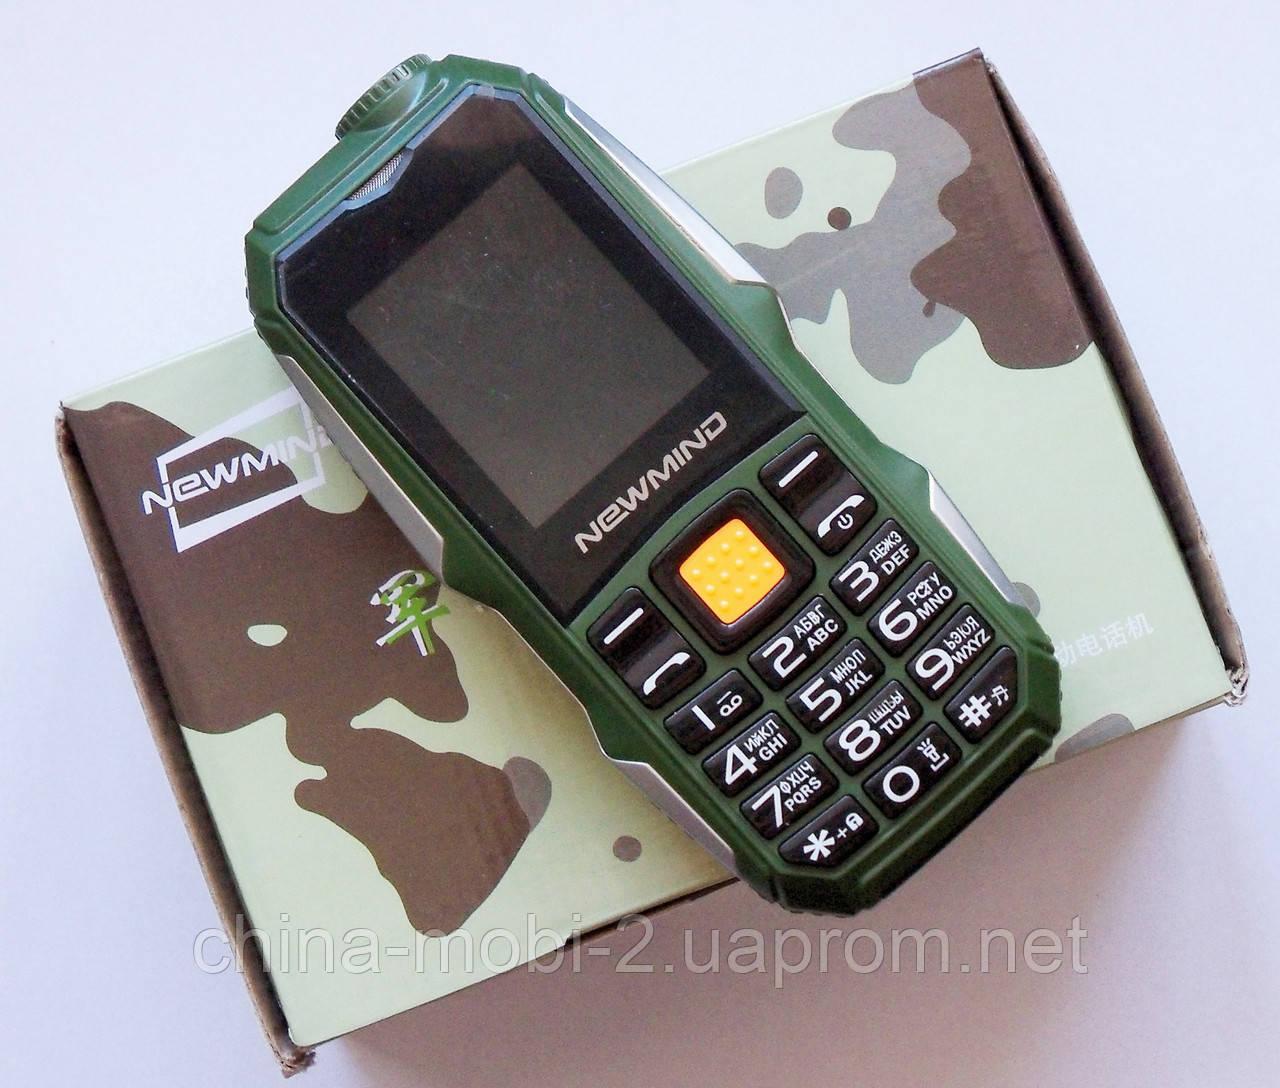 Противоударный LAND ROVER Newmind F6000 - 2 Sim (2600 mAh) green